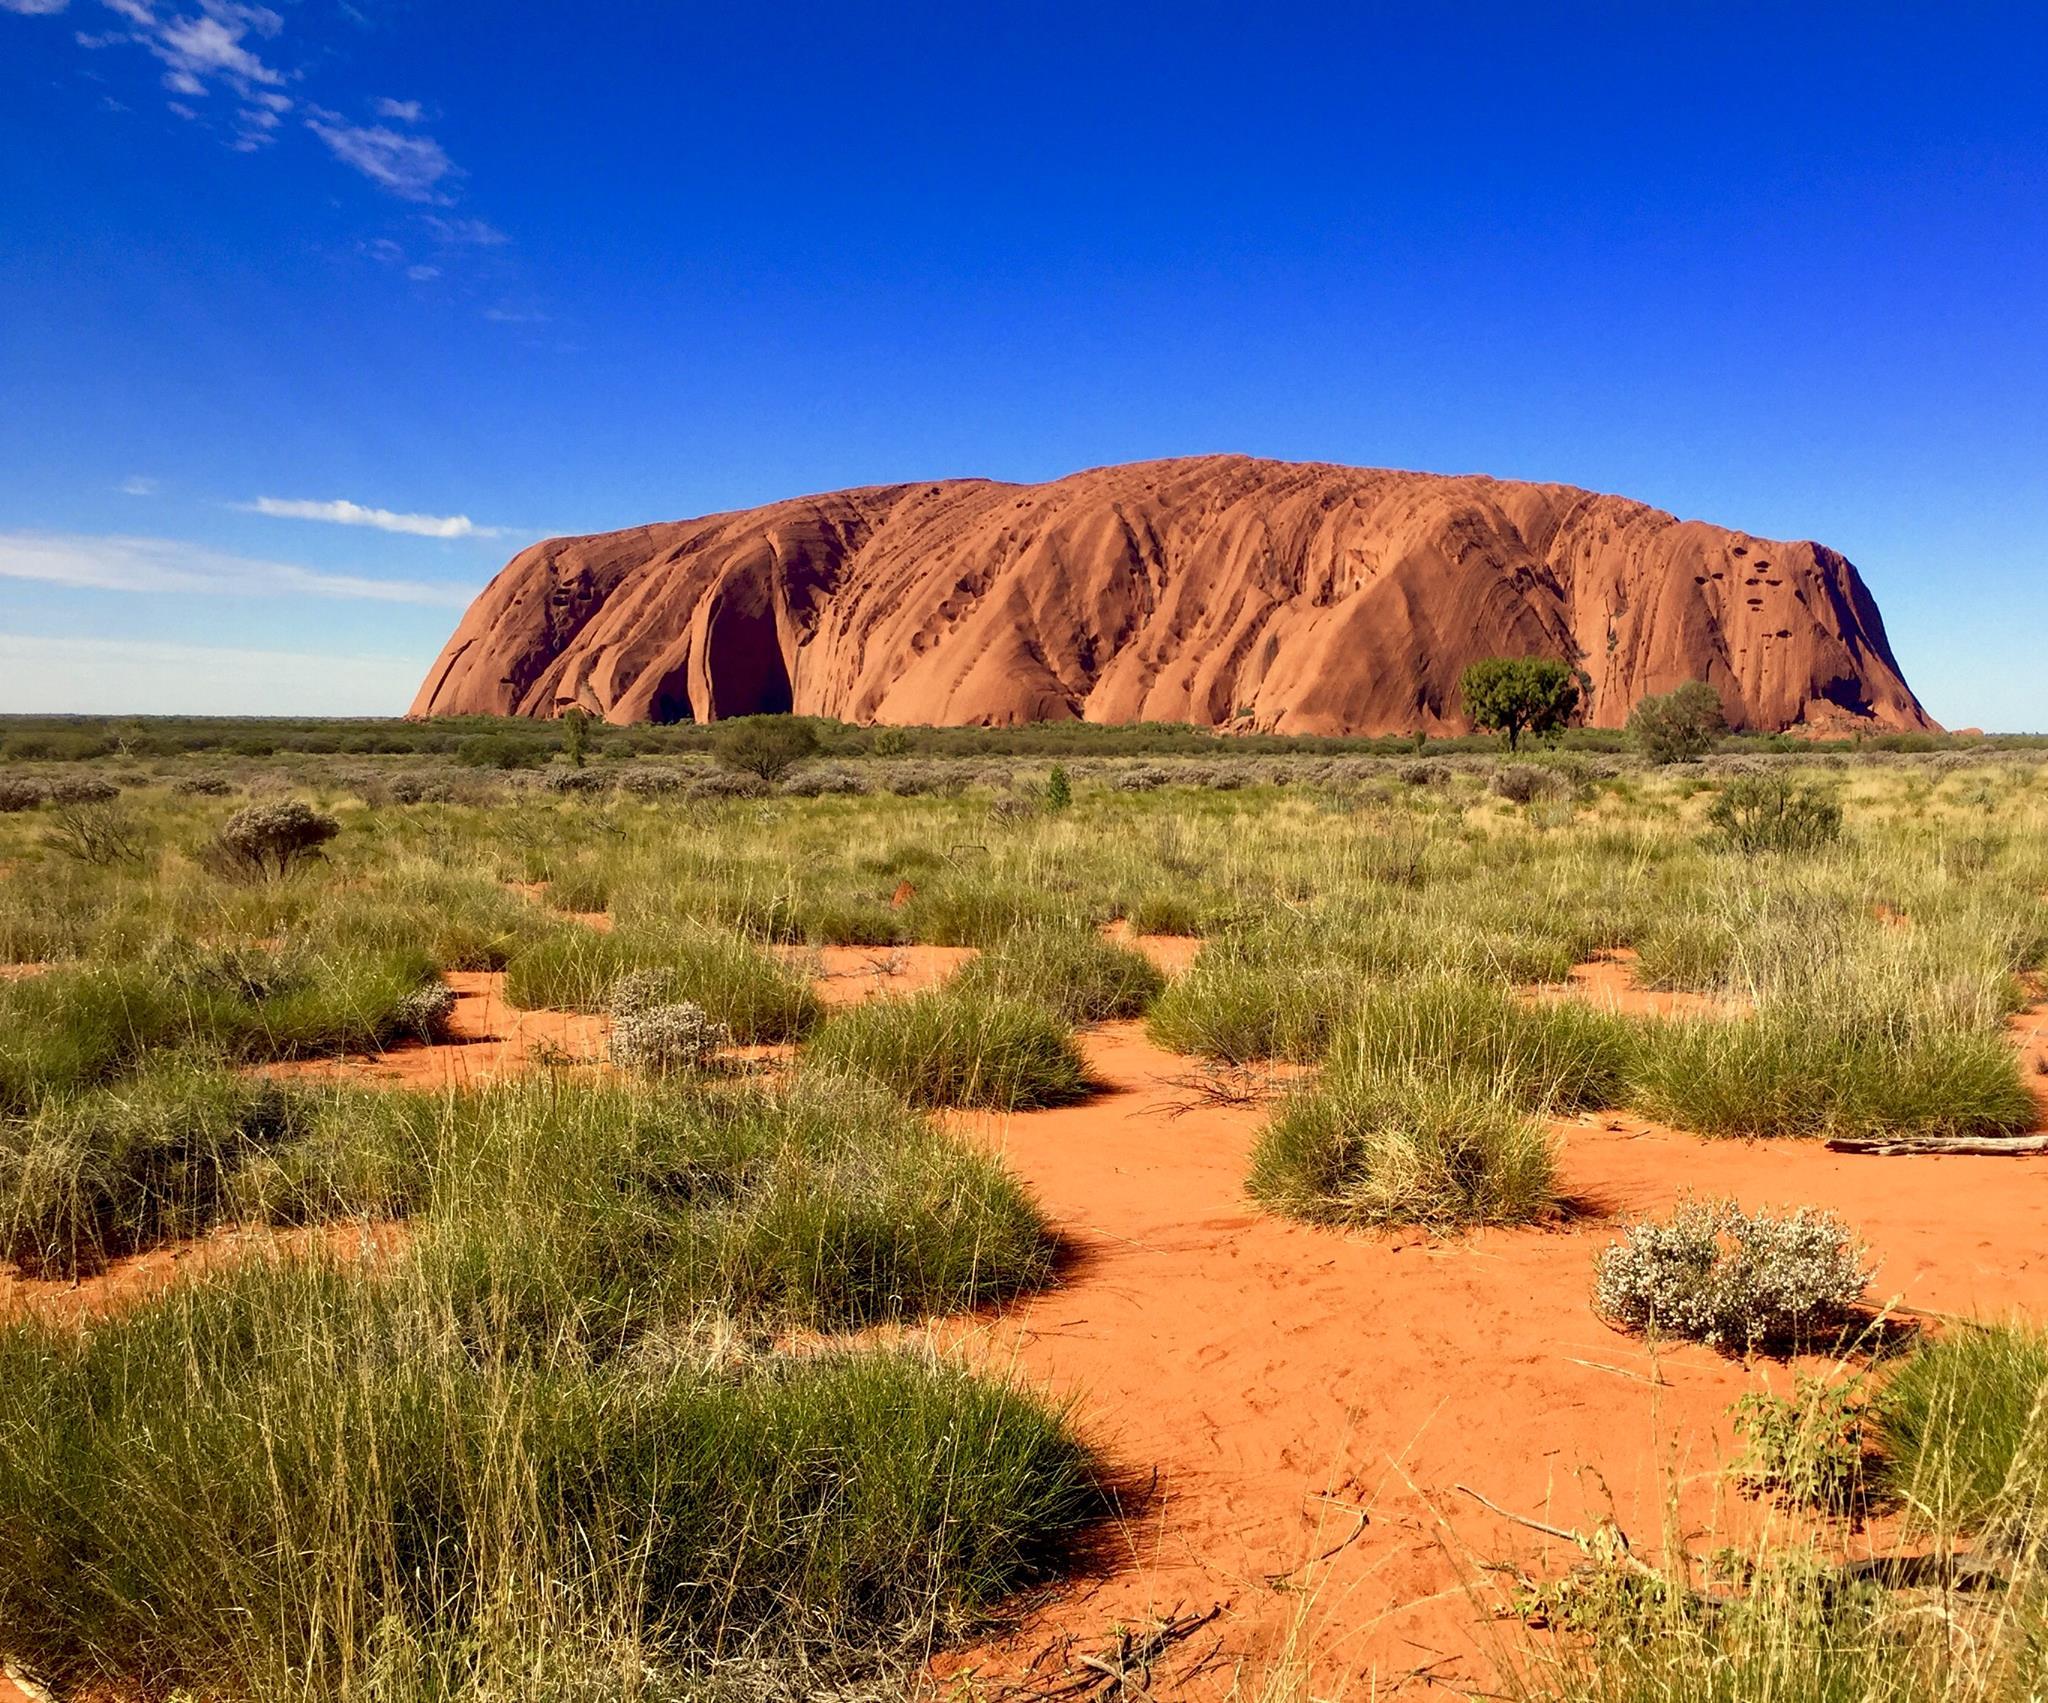 Vue d'Uluru au cœur de l'Australie centrale. © photo : Aboriginal Signature • Estrangin Fine Art Gallery